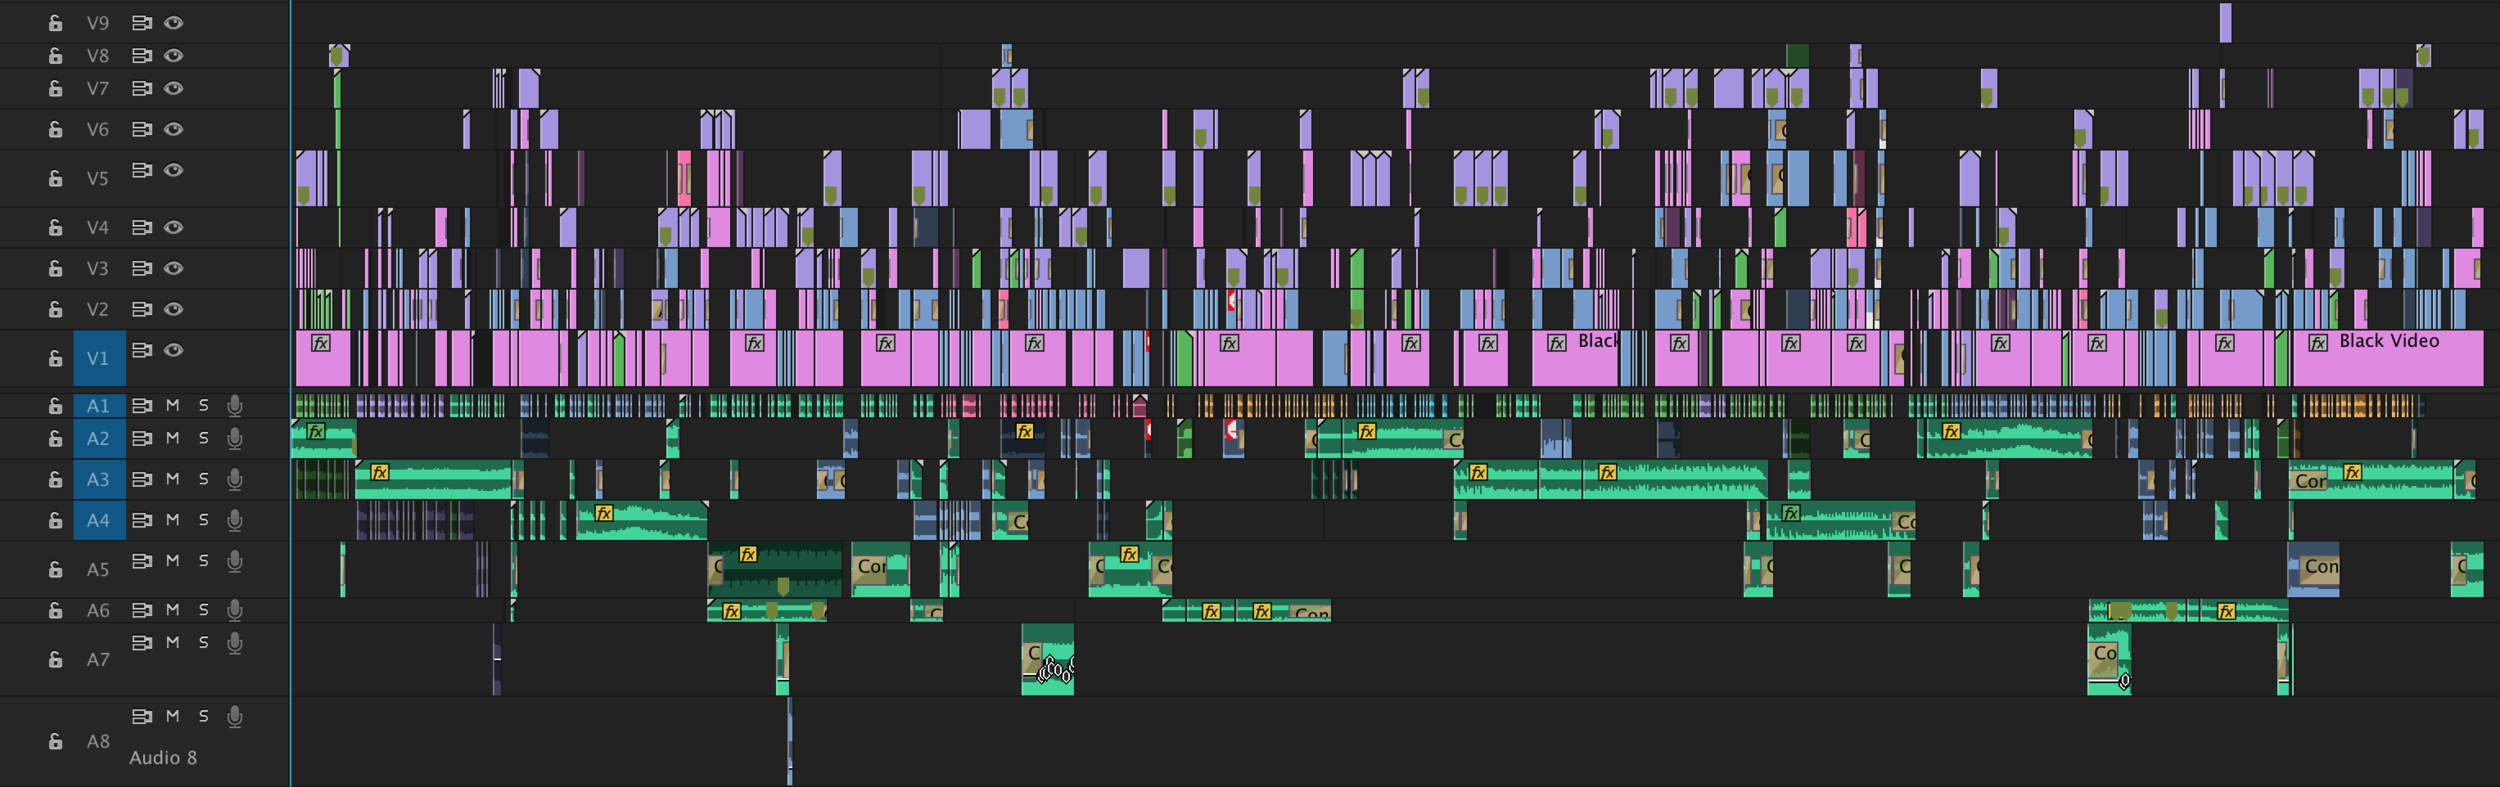 Current editing timeline for Episode 4